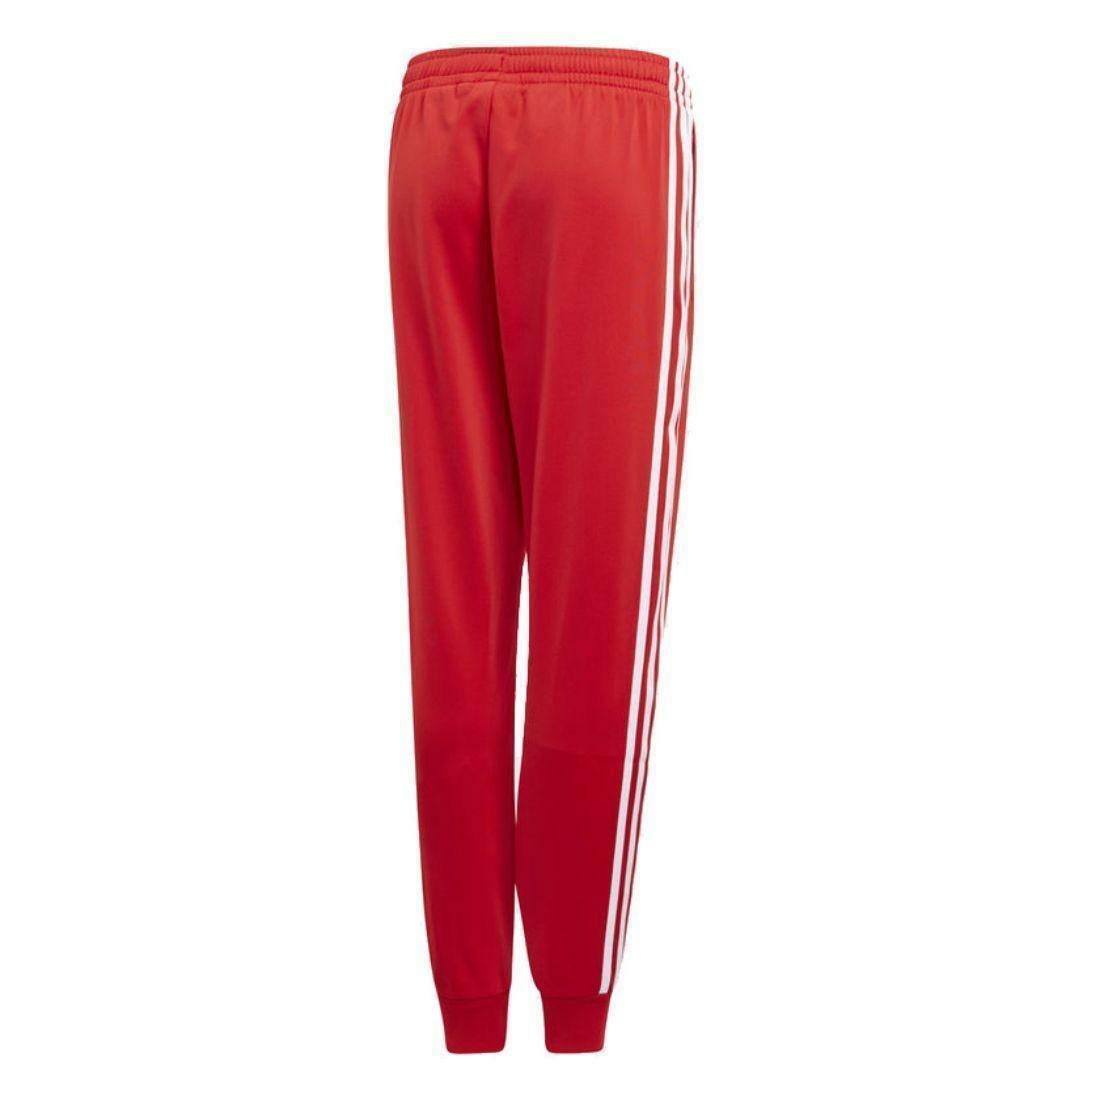 adidas adidas sst pant j pantaloni bambino rossi